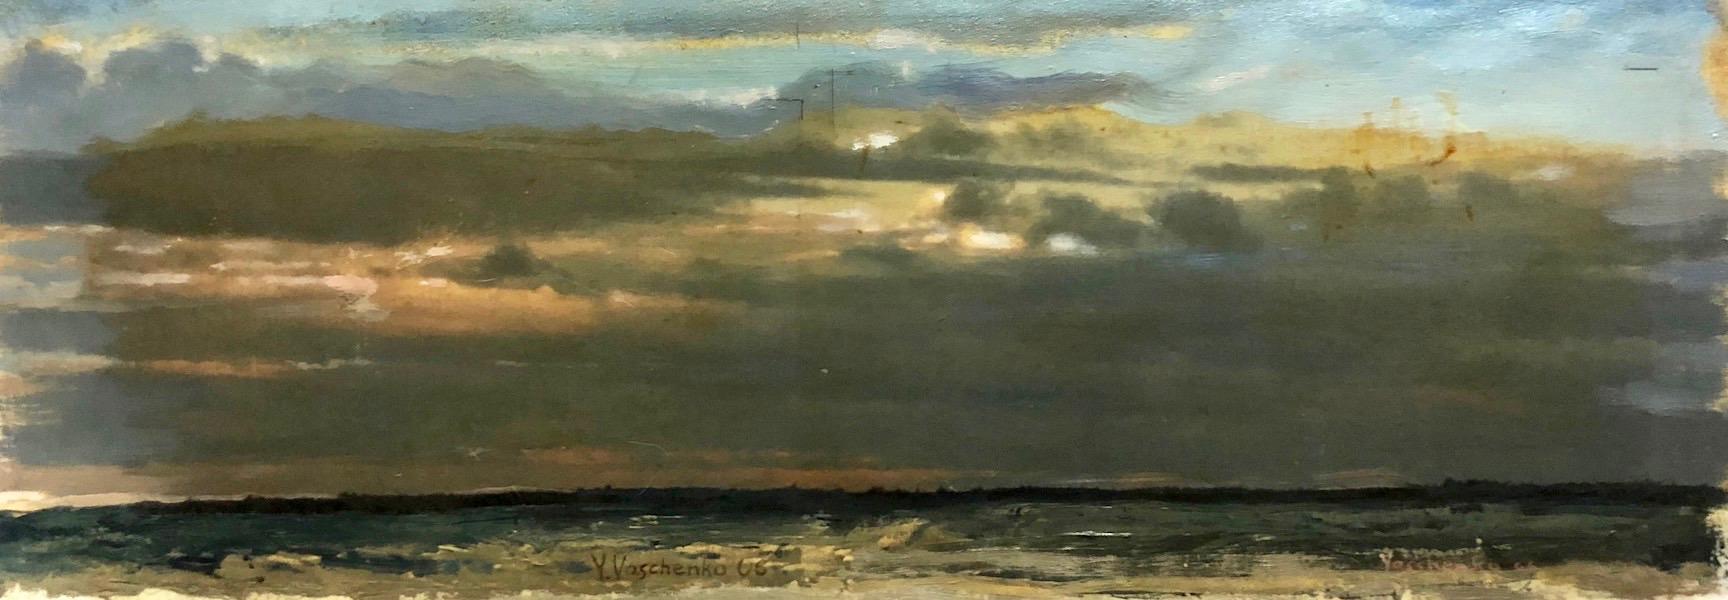 Still Evening Twilight Has Fallen , 2006 Oil on Canvas 6h x 17w in